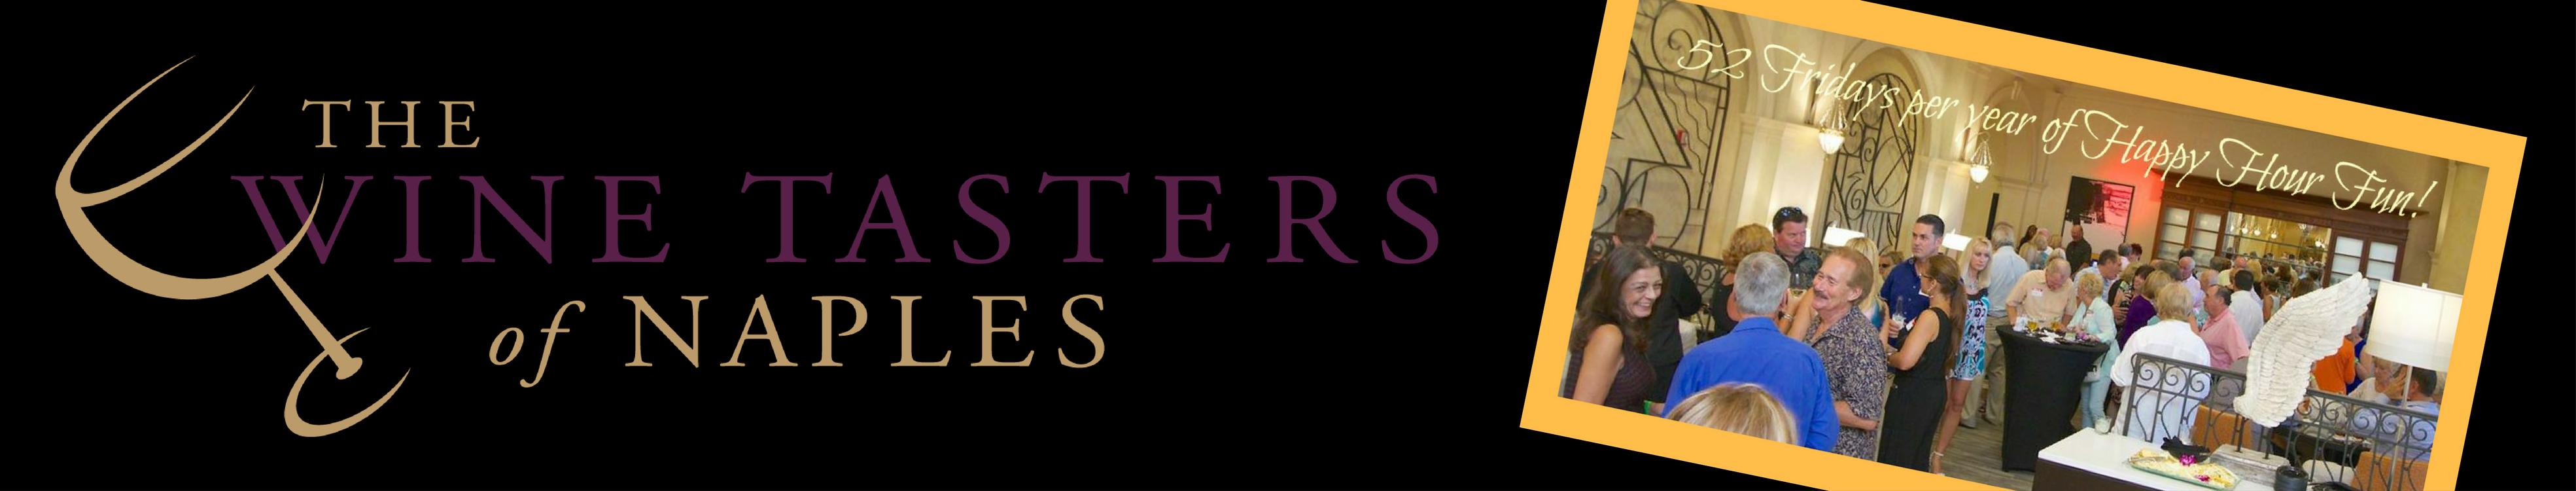 Wine Tasters of Naples website cover